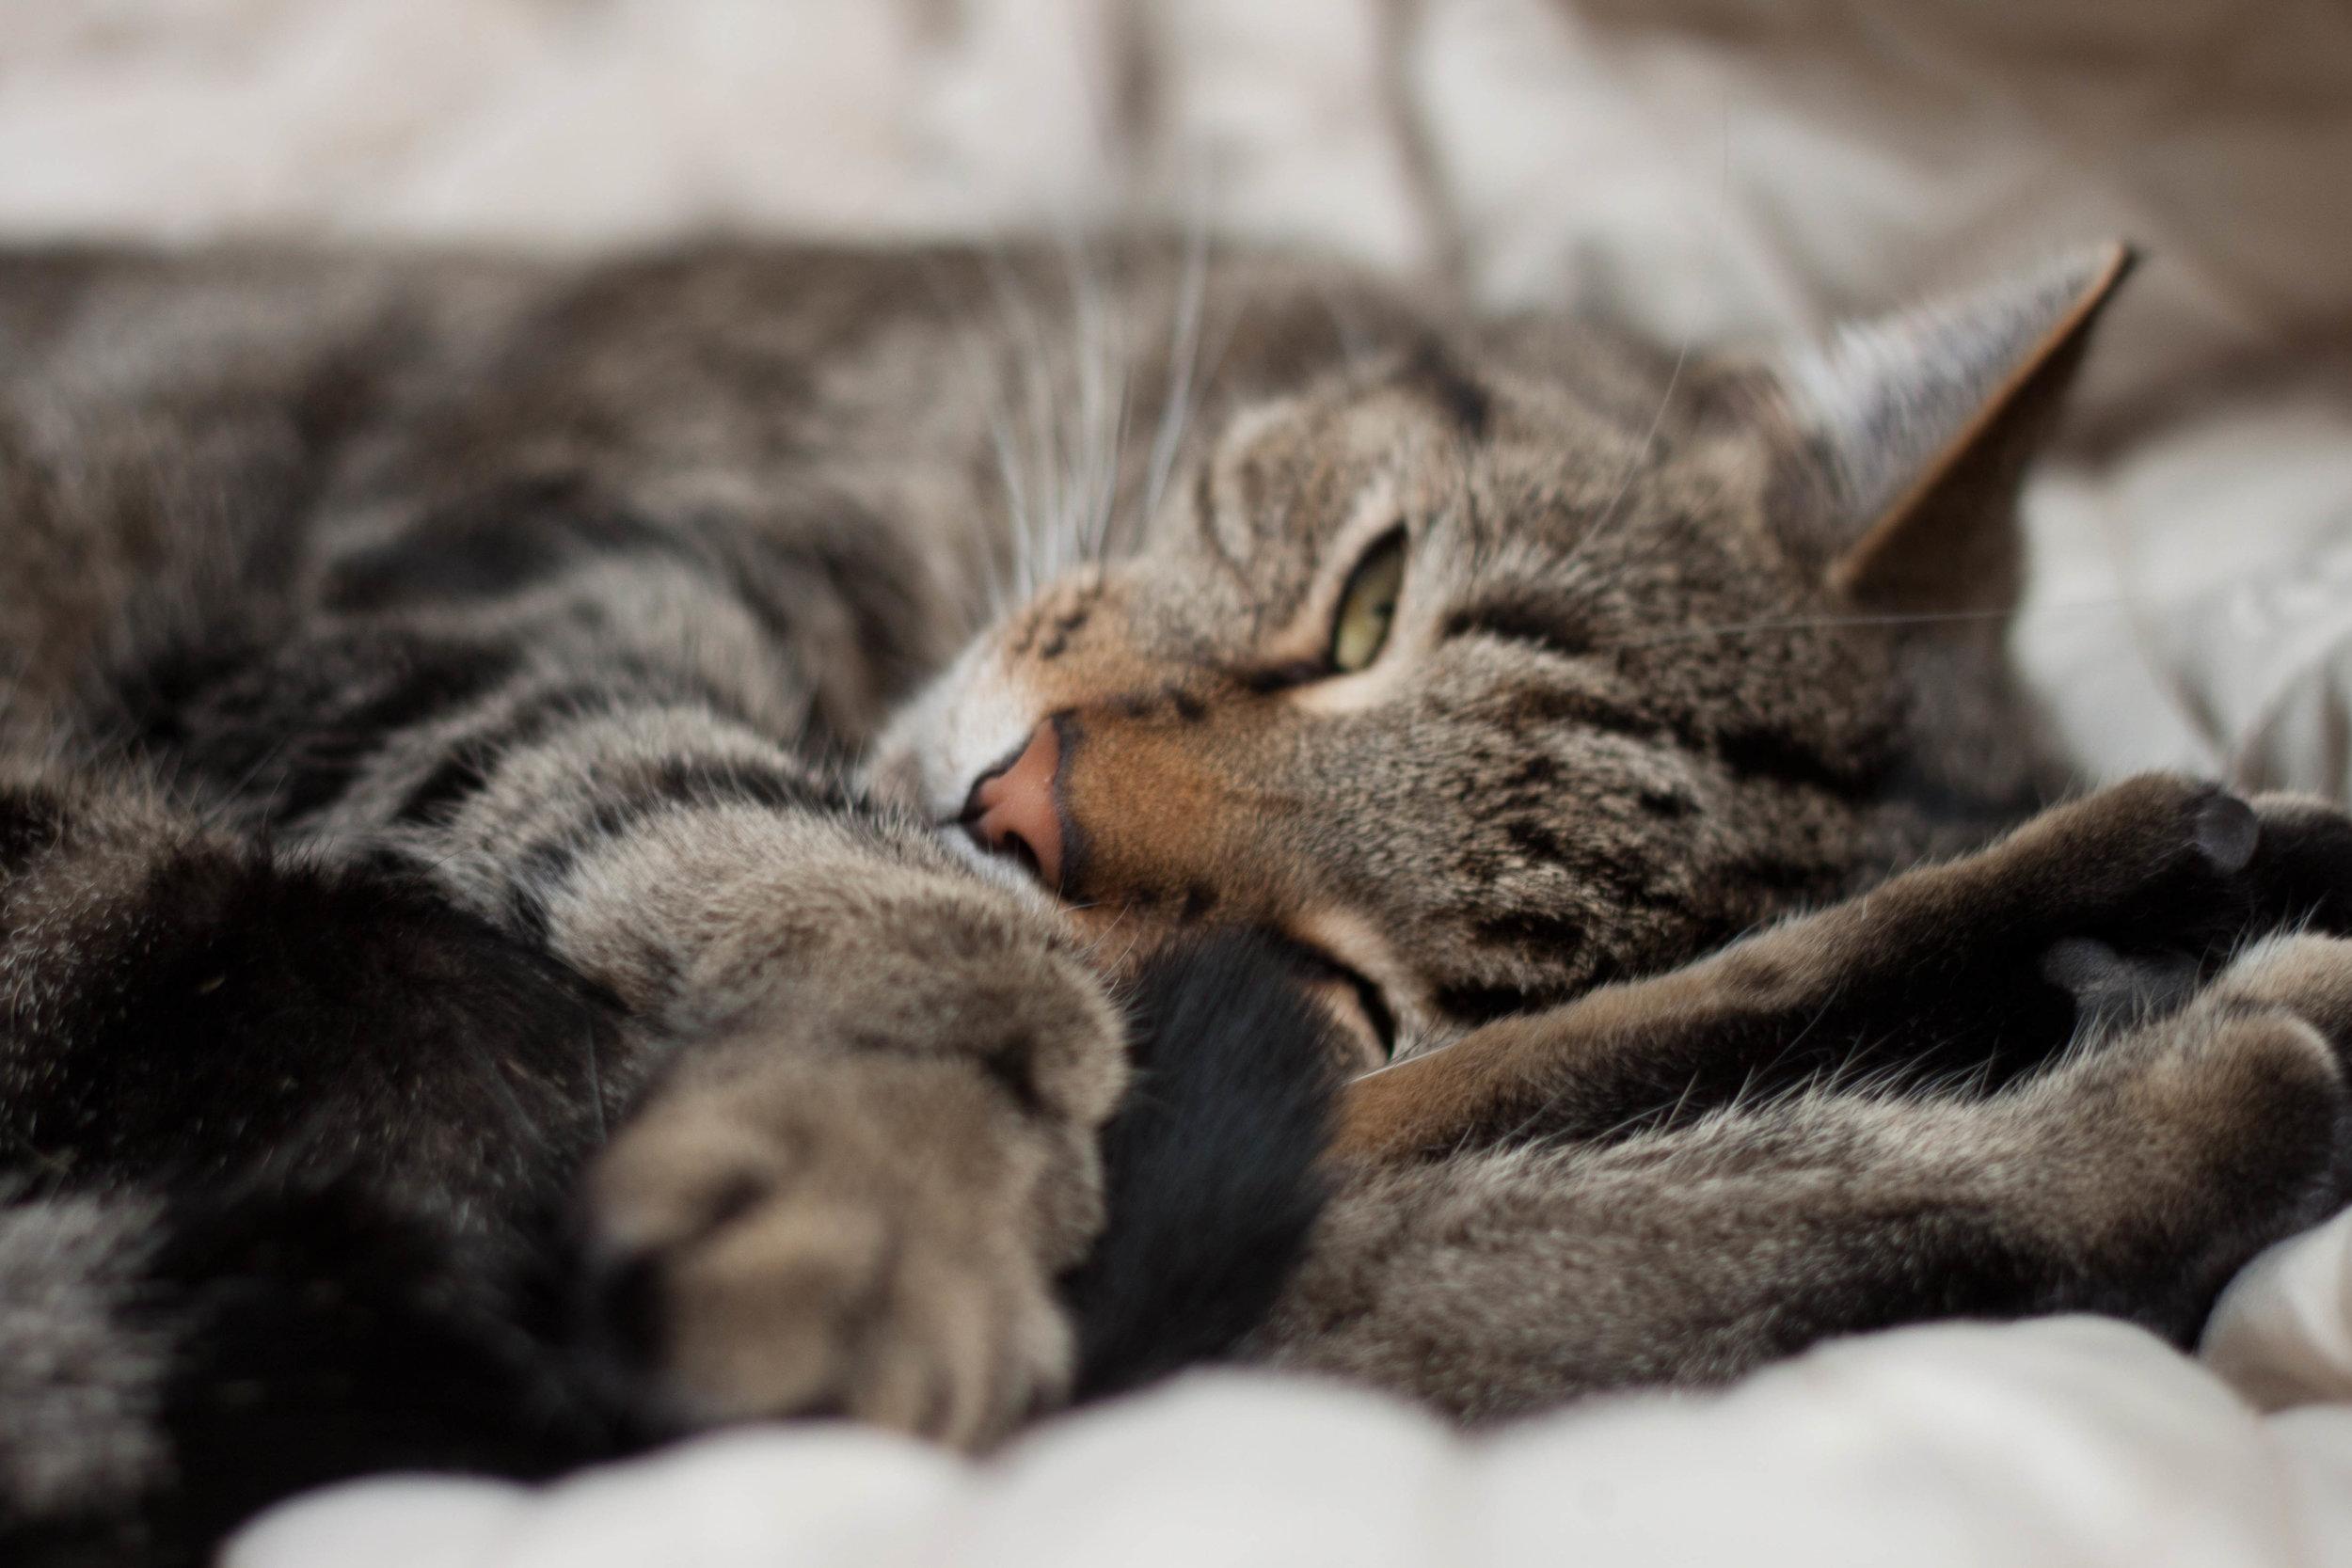 My cat, Chiyo, naps at home.